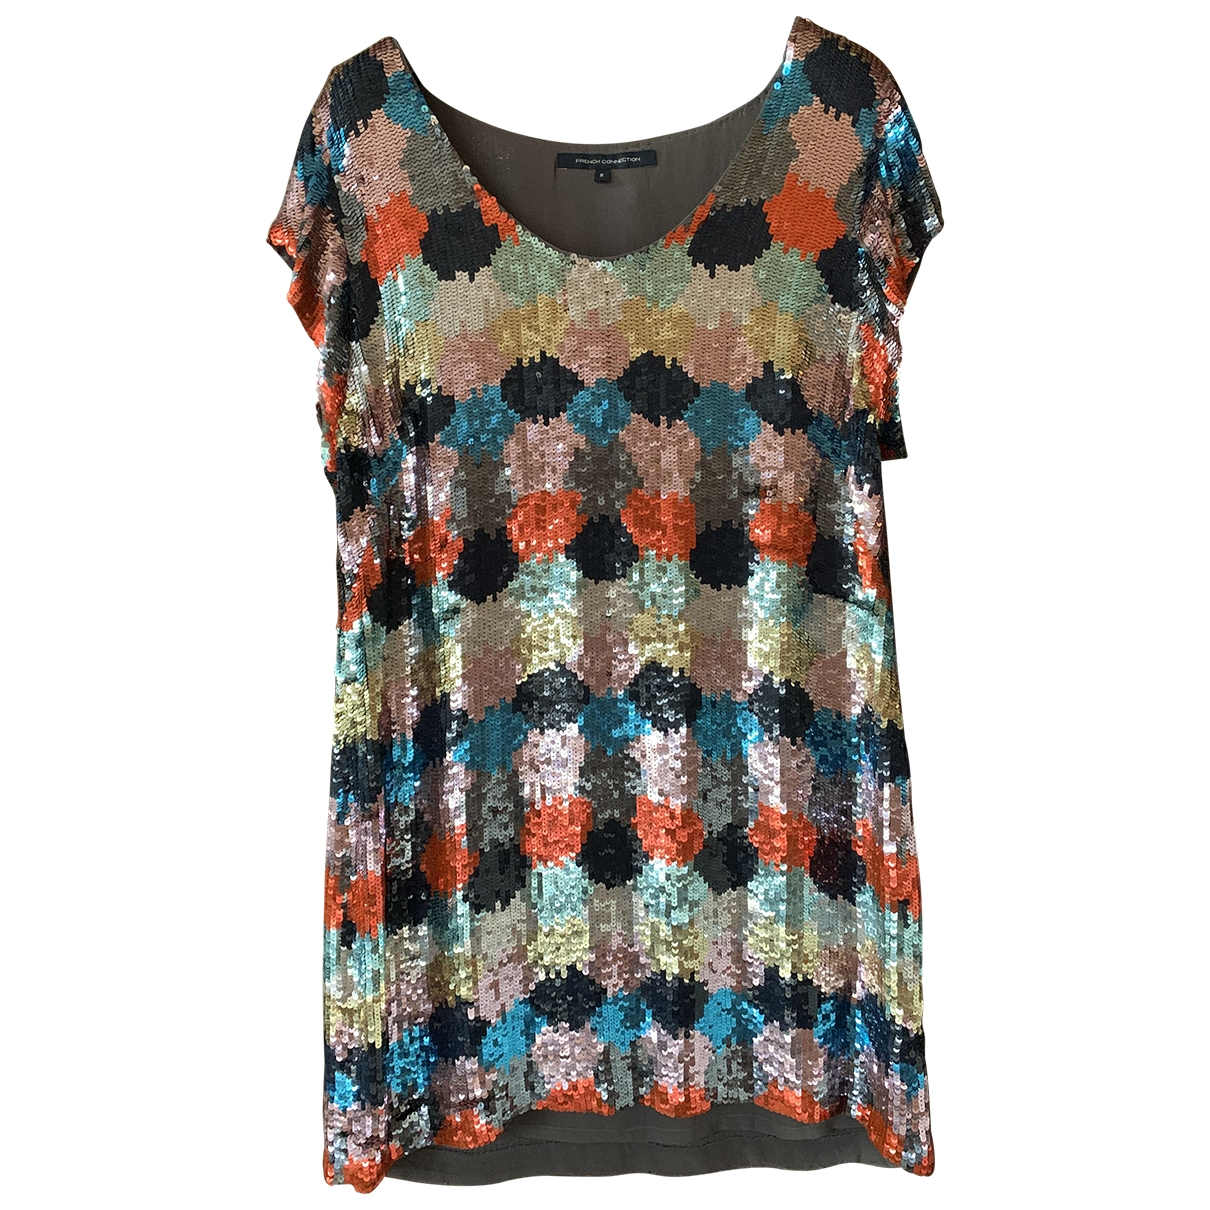 French Connection \N Multicolour Glitter dress for Women 8 UK